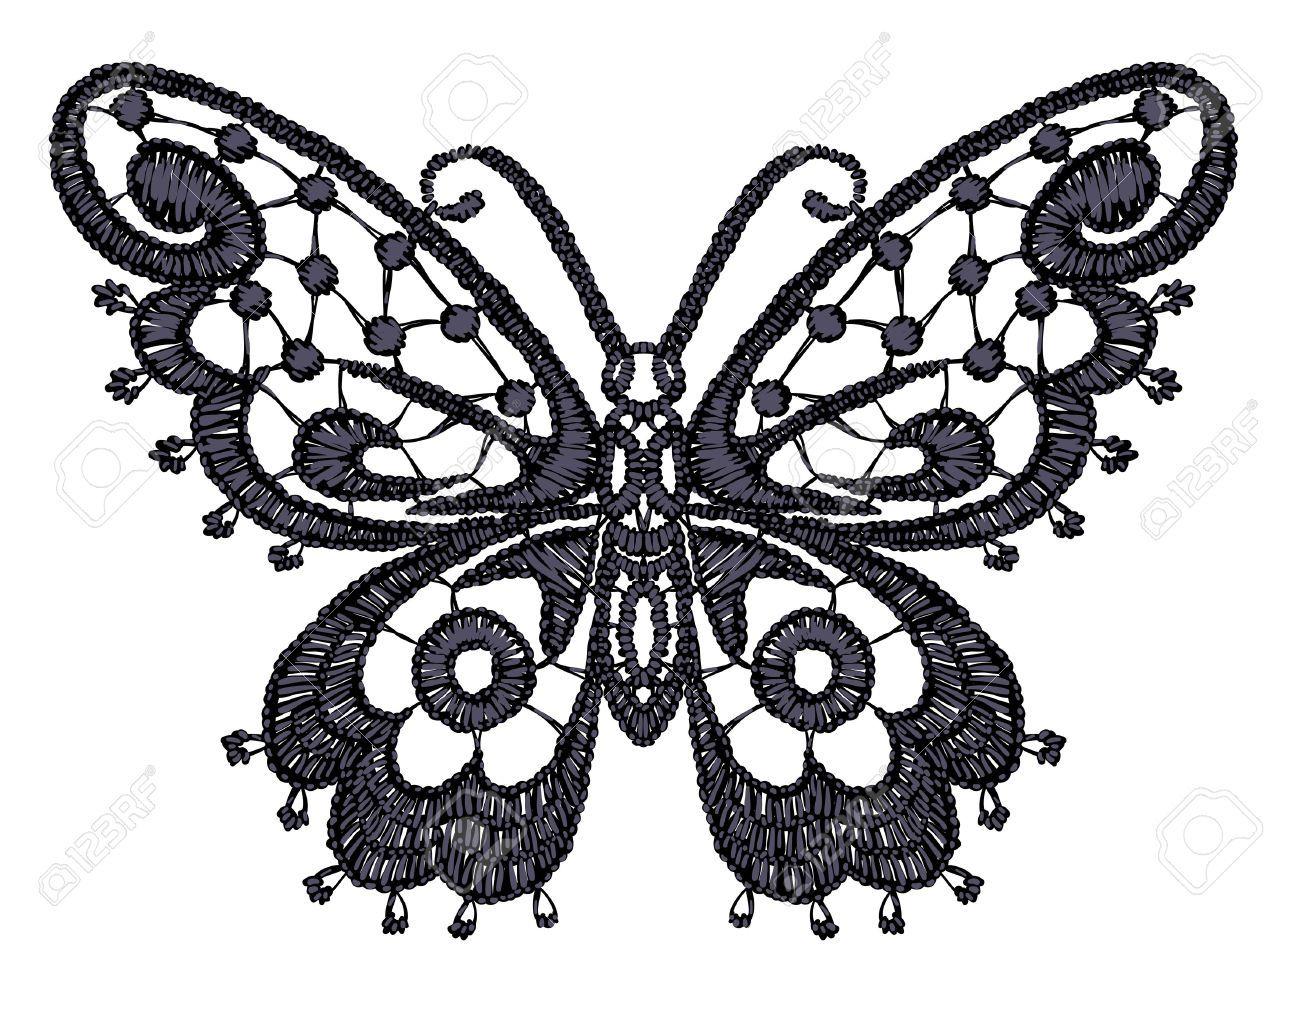 Pin by 𝕬𝖓𝖓𝖒𝖆𝖗𝖎𝖊 on rhσpαlσcєrα ღ lєpídσptєrα Butterfly